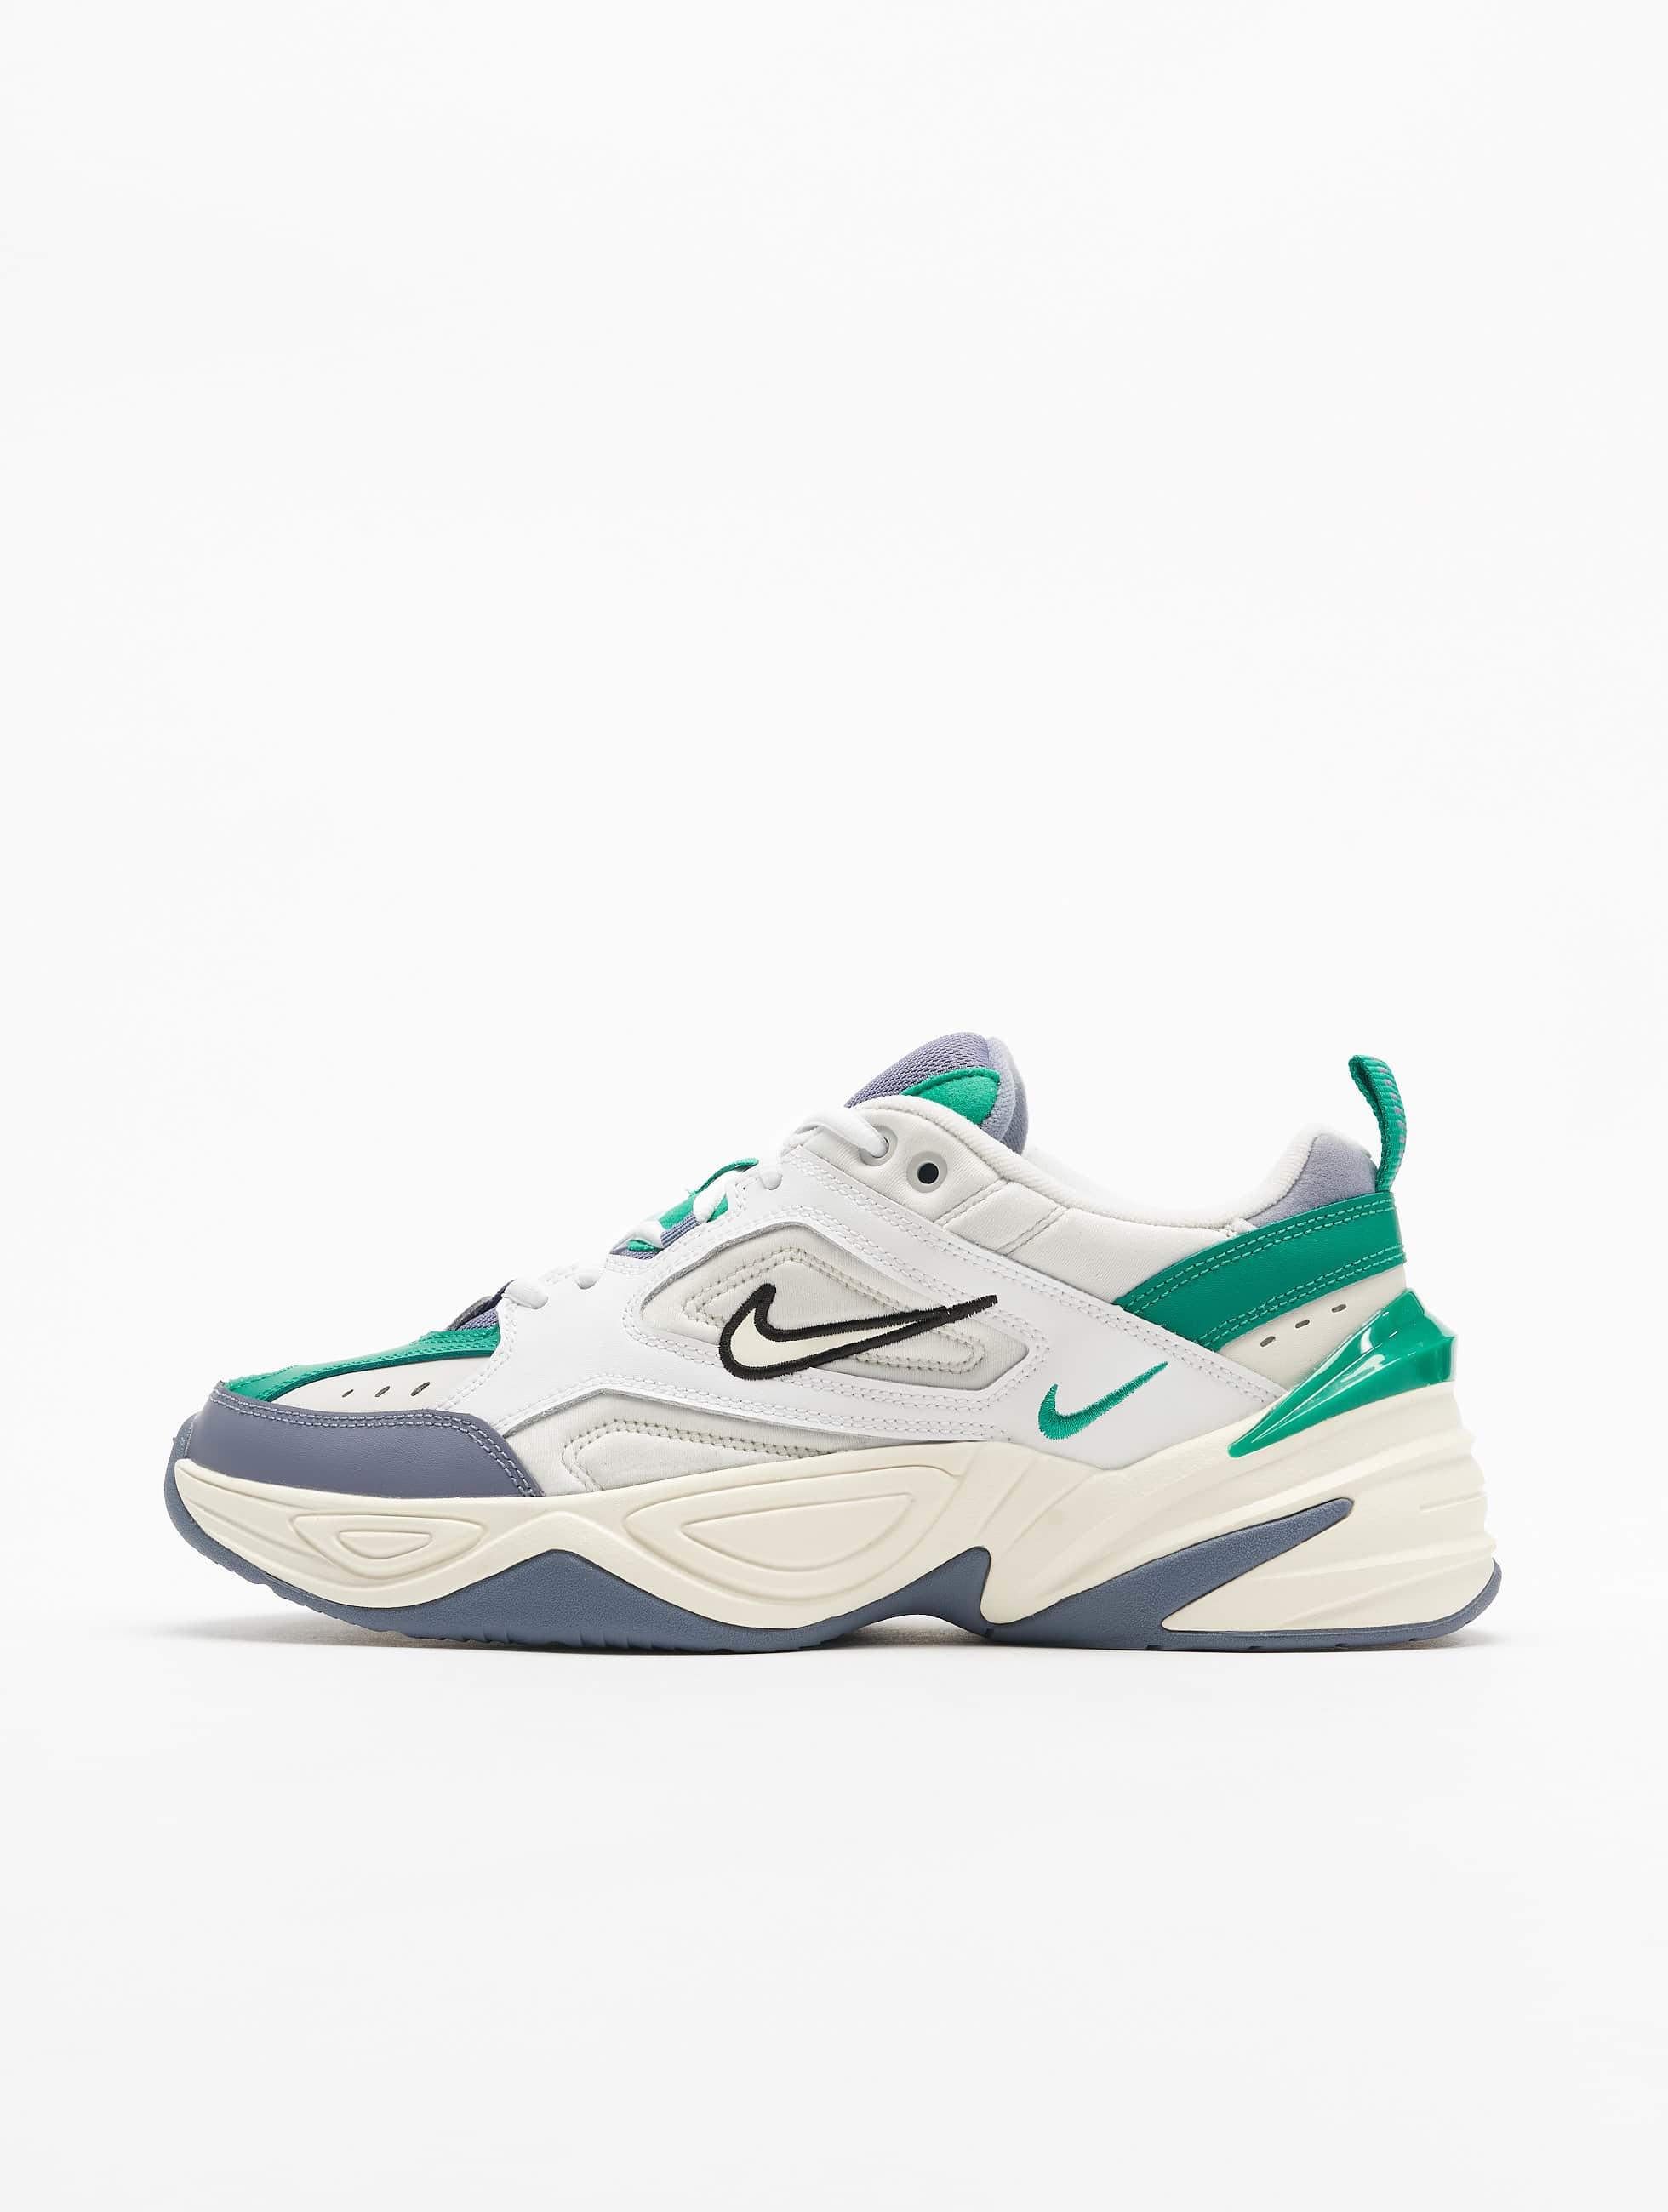 Köpa Nike Air Max Thea Herr Blå Svart Vit 100% Autentisk